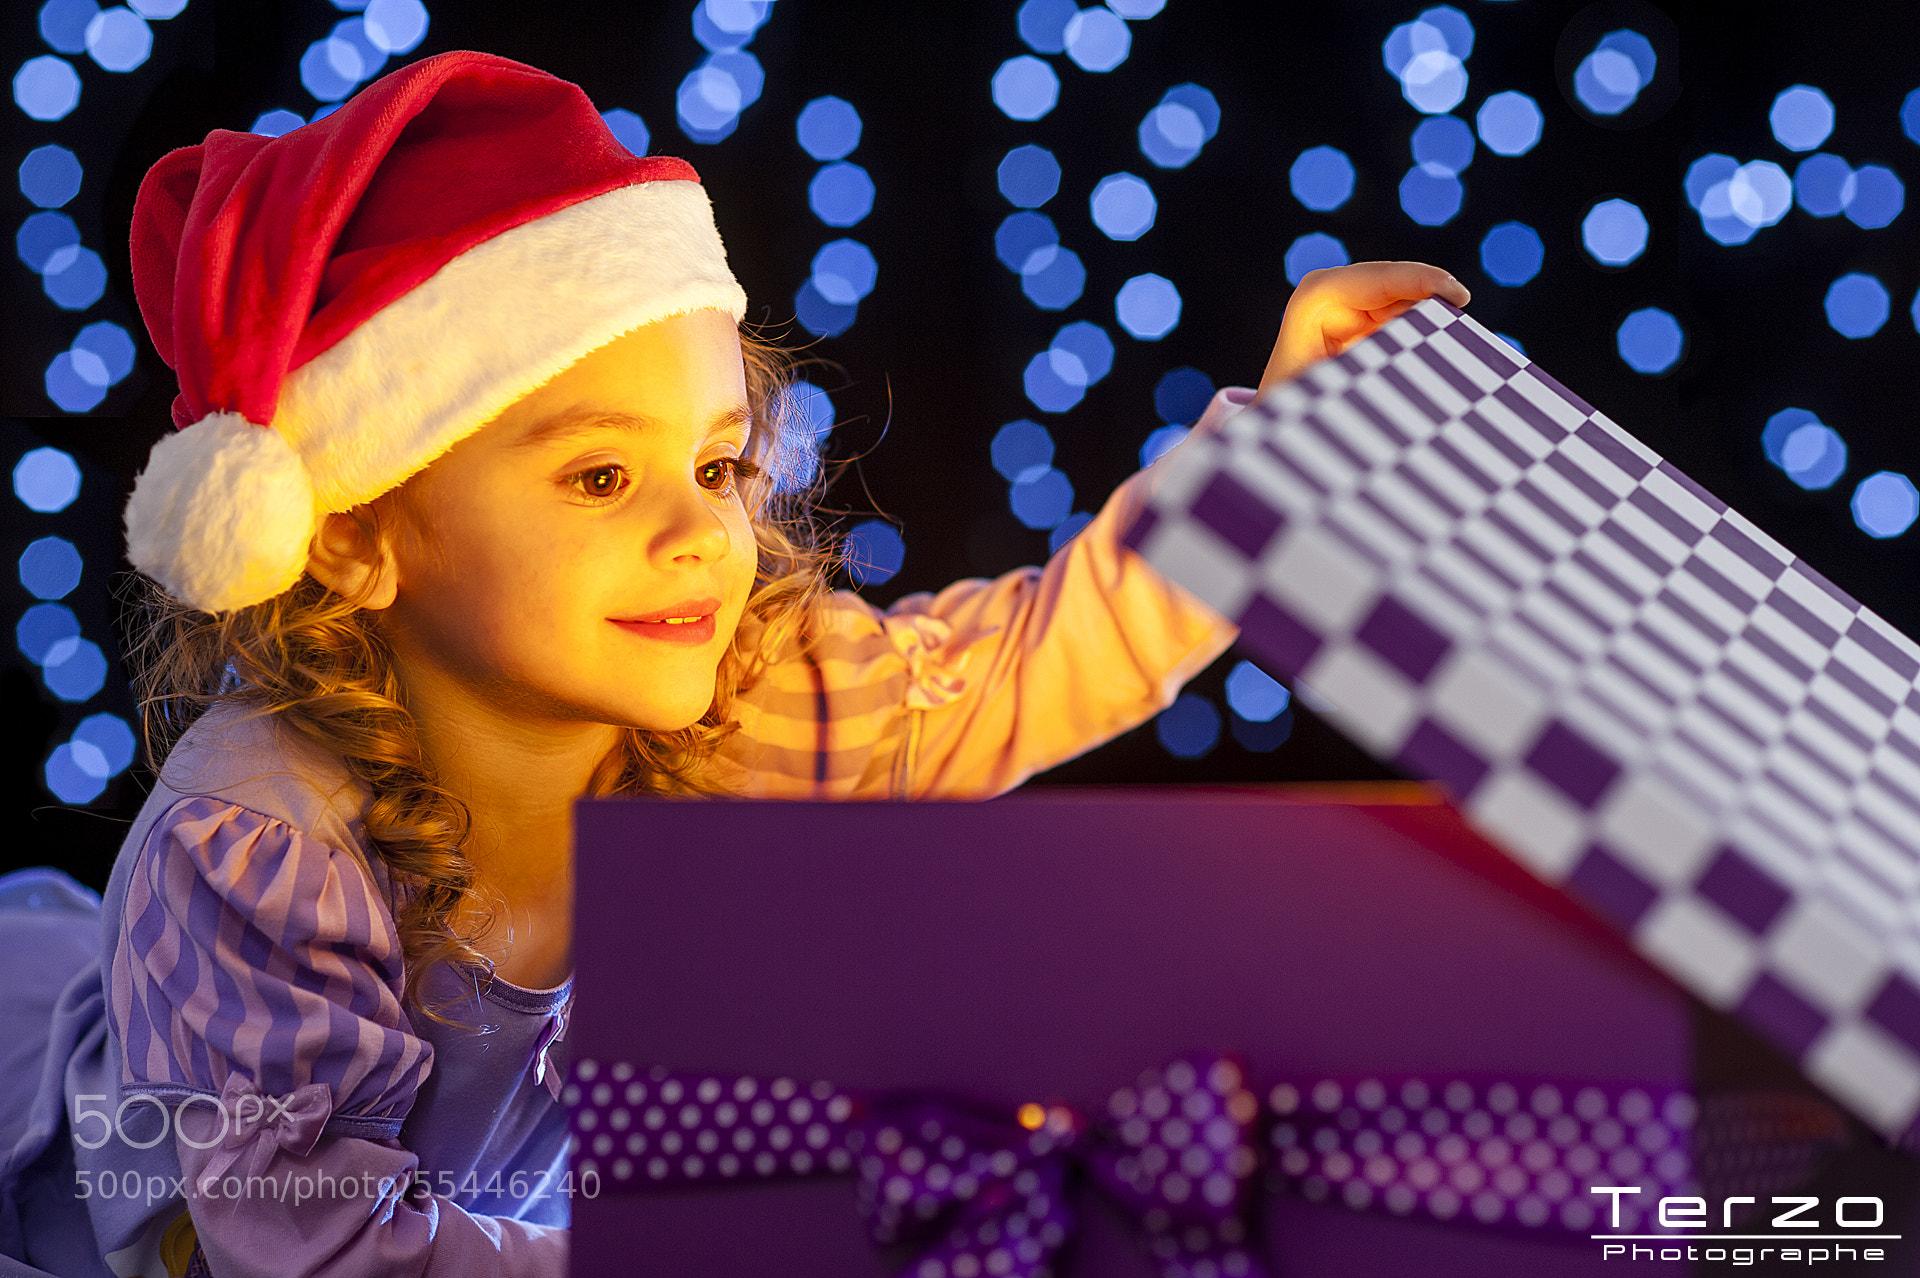 Photograph Joyeux Noël! by Terzo on 500px